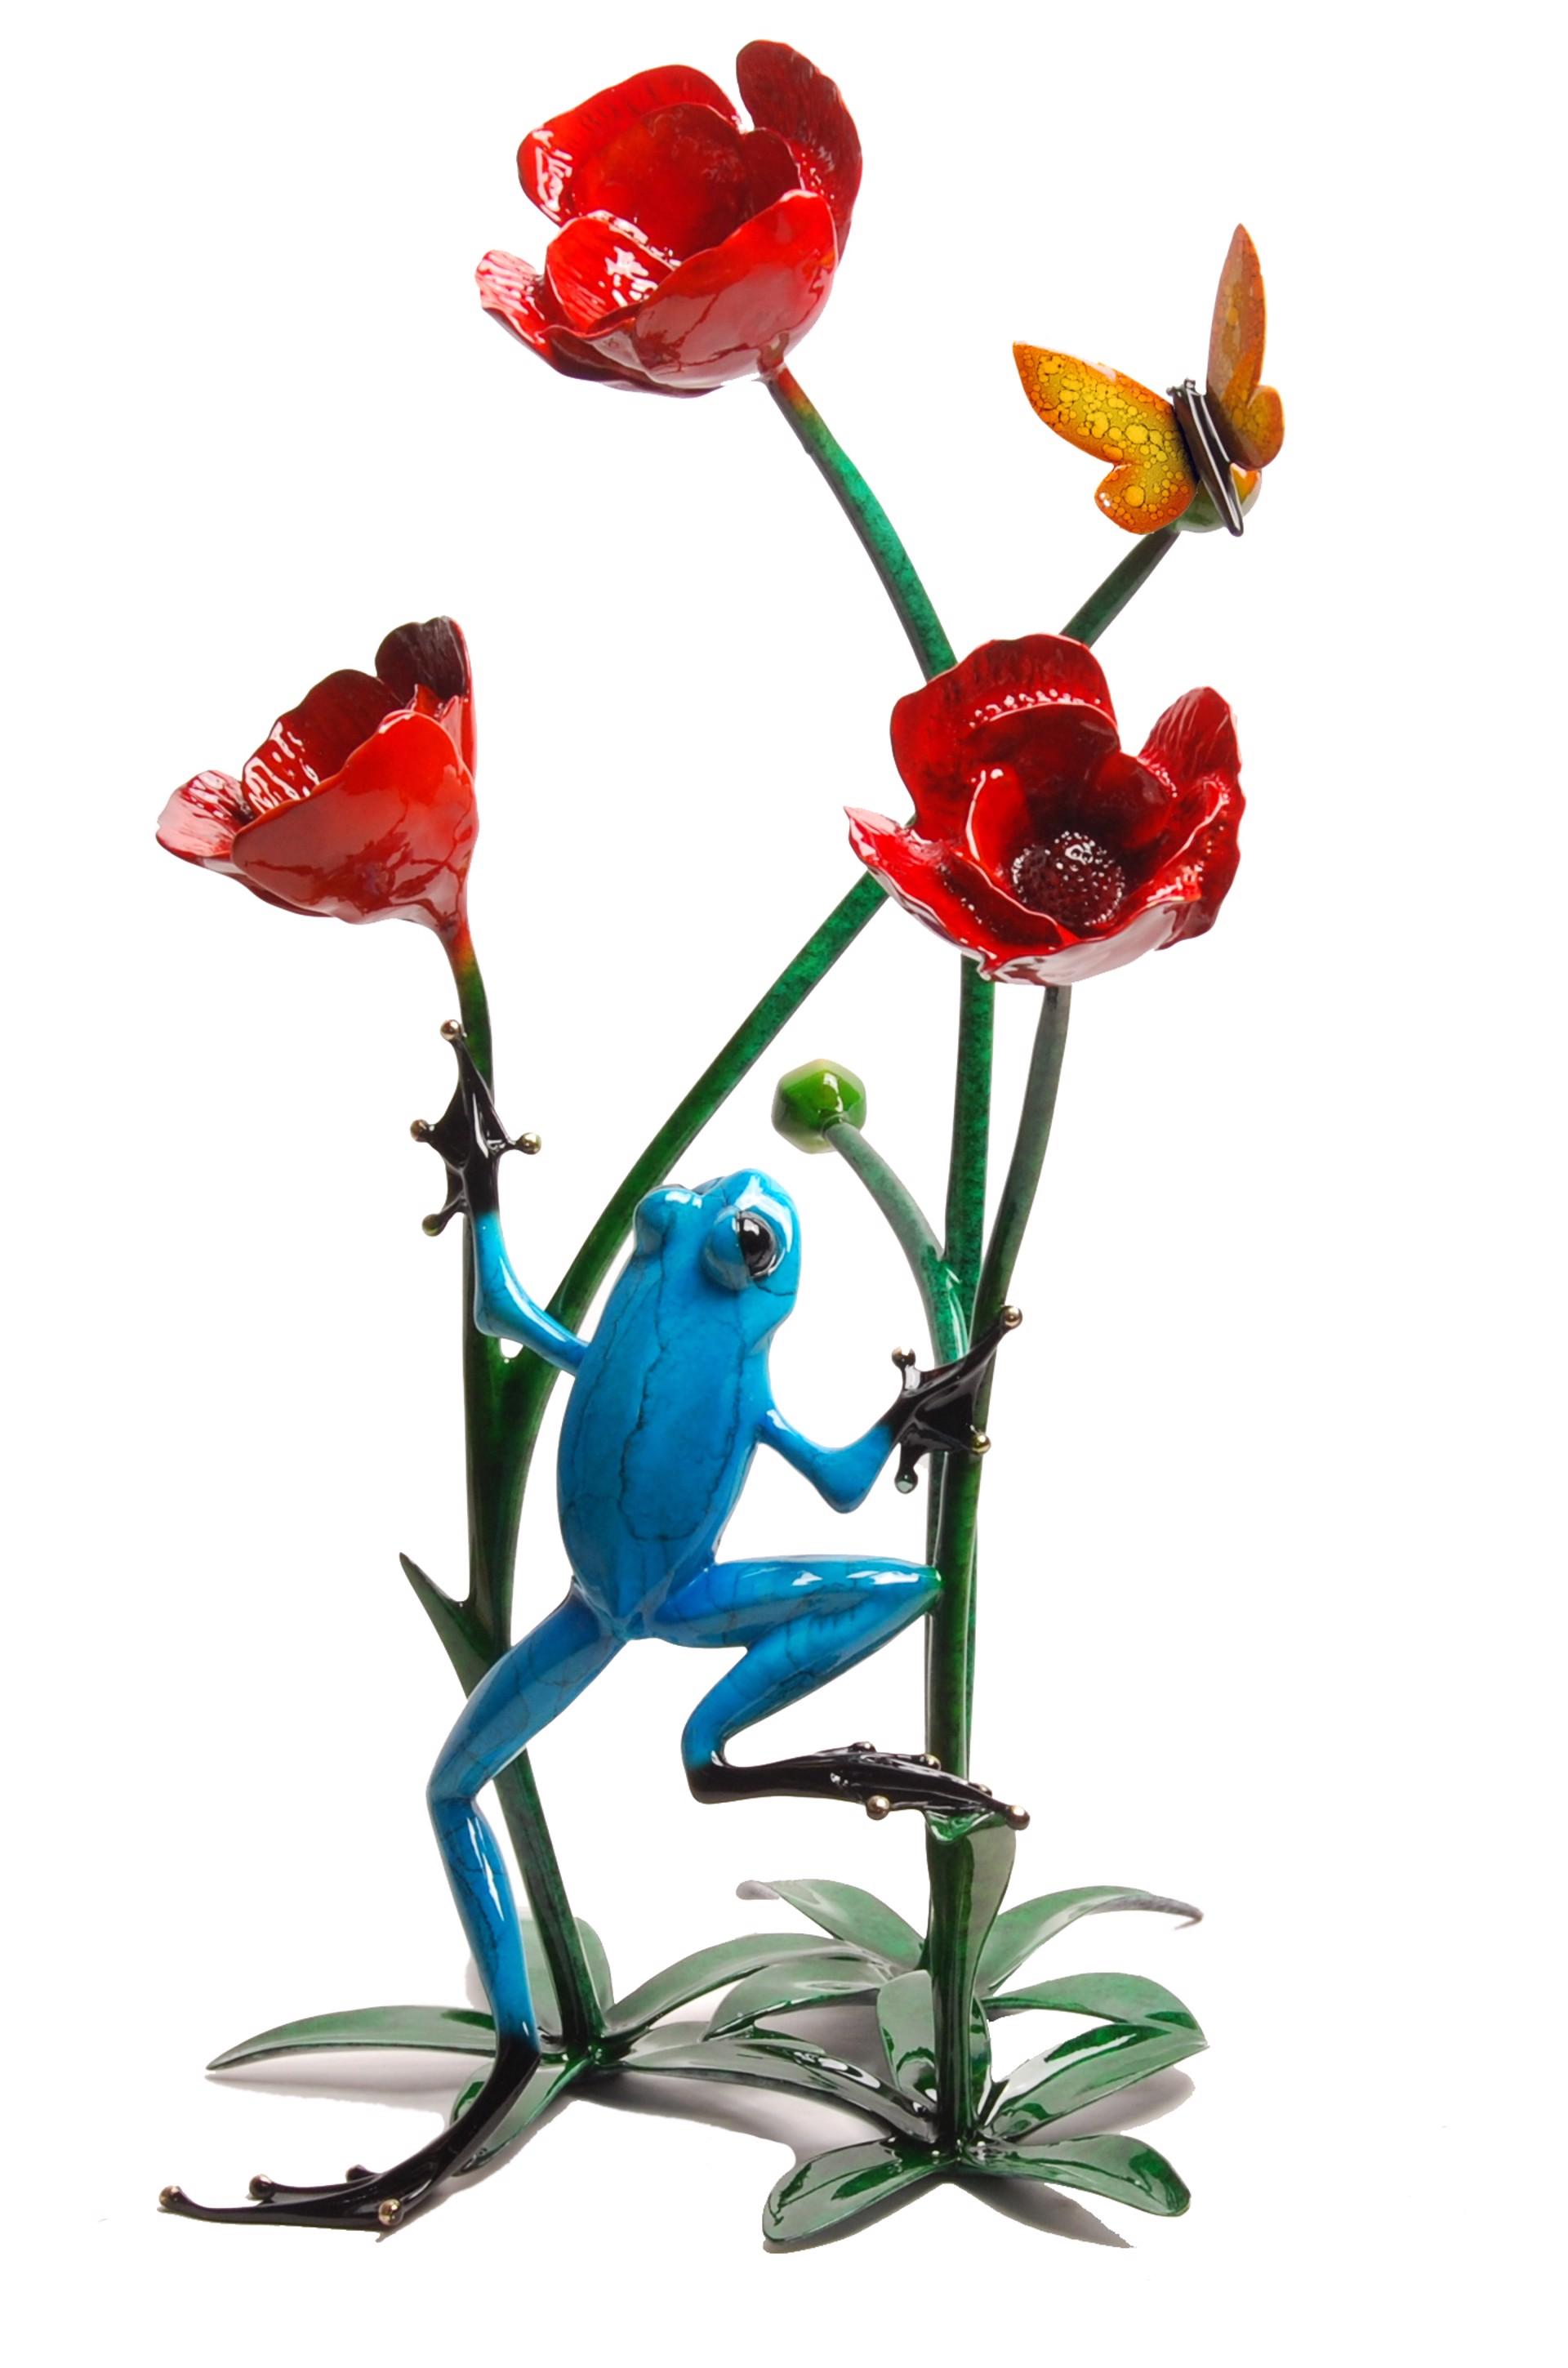 Poppy BF178 by Tim Cotterill